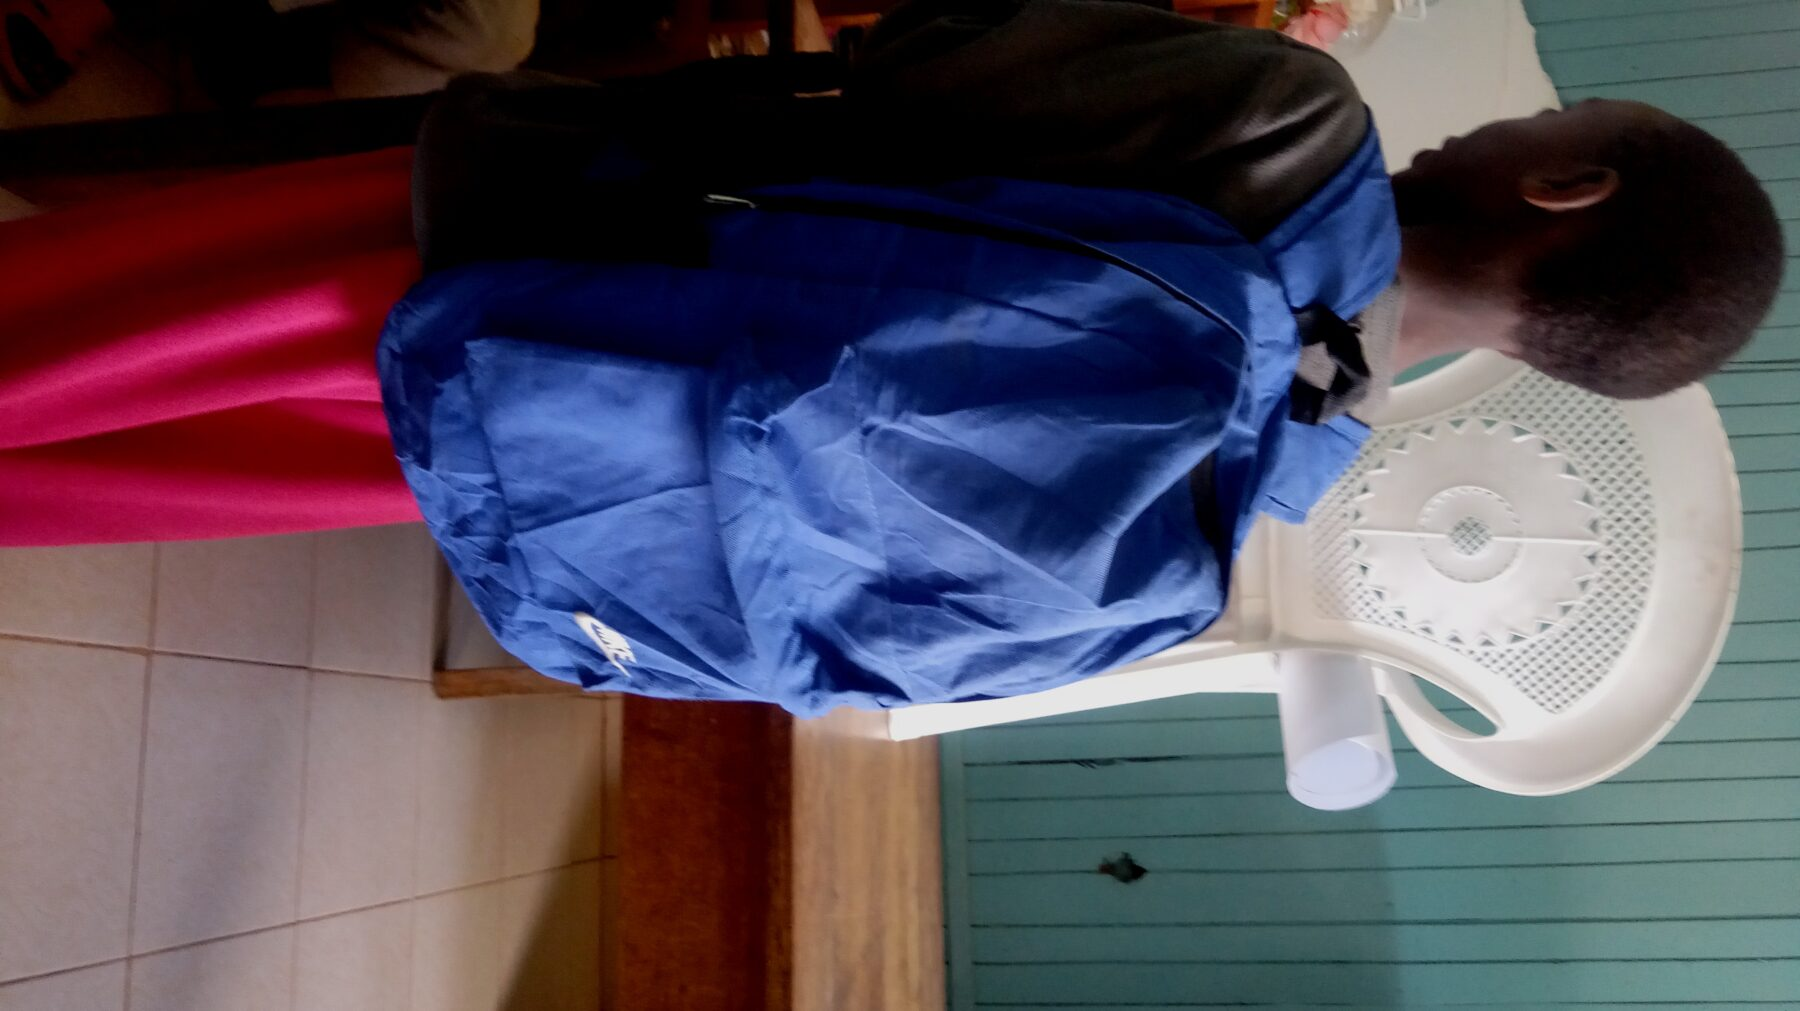 Kang'ara carrying his bag